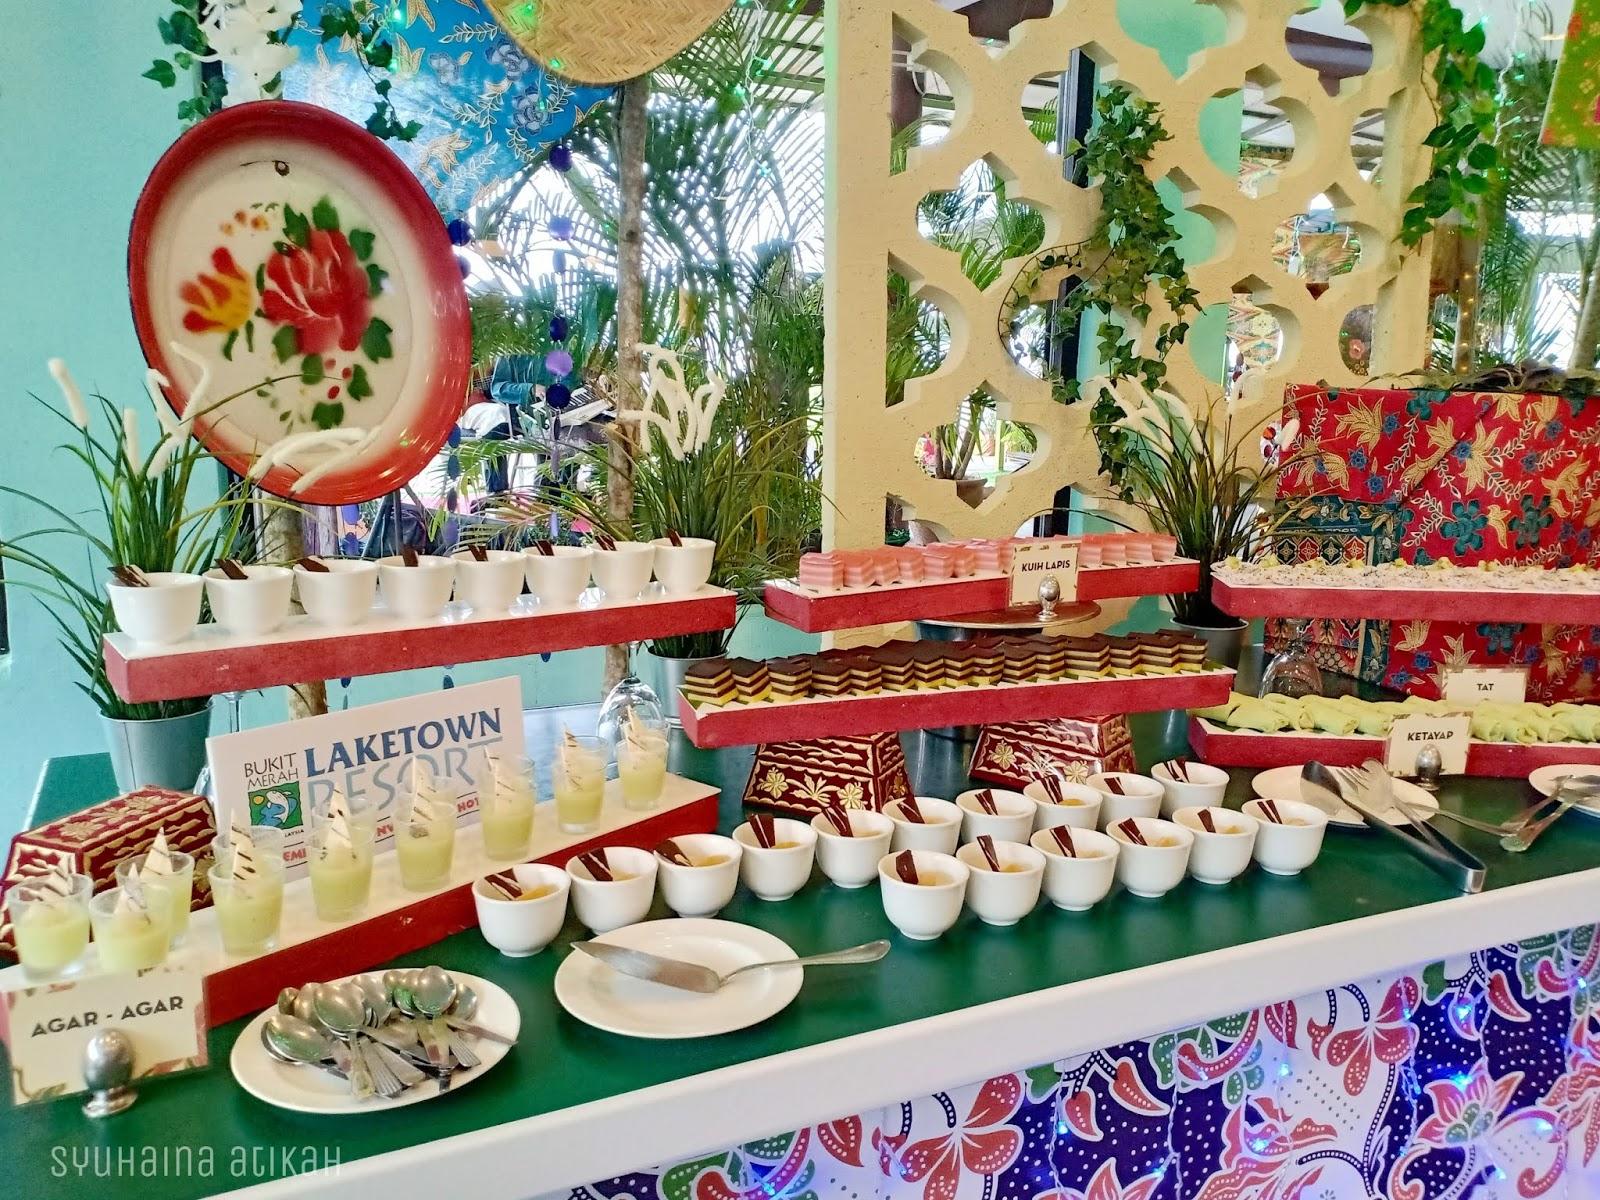 Ramadhan Buffet di Bukit Merah Laketown Resort